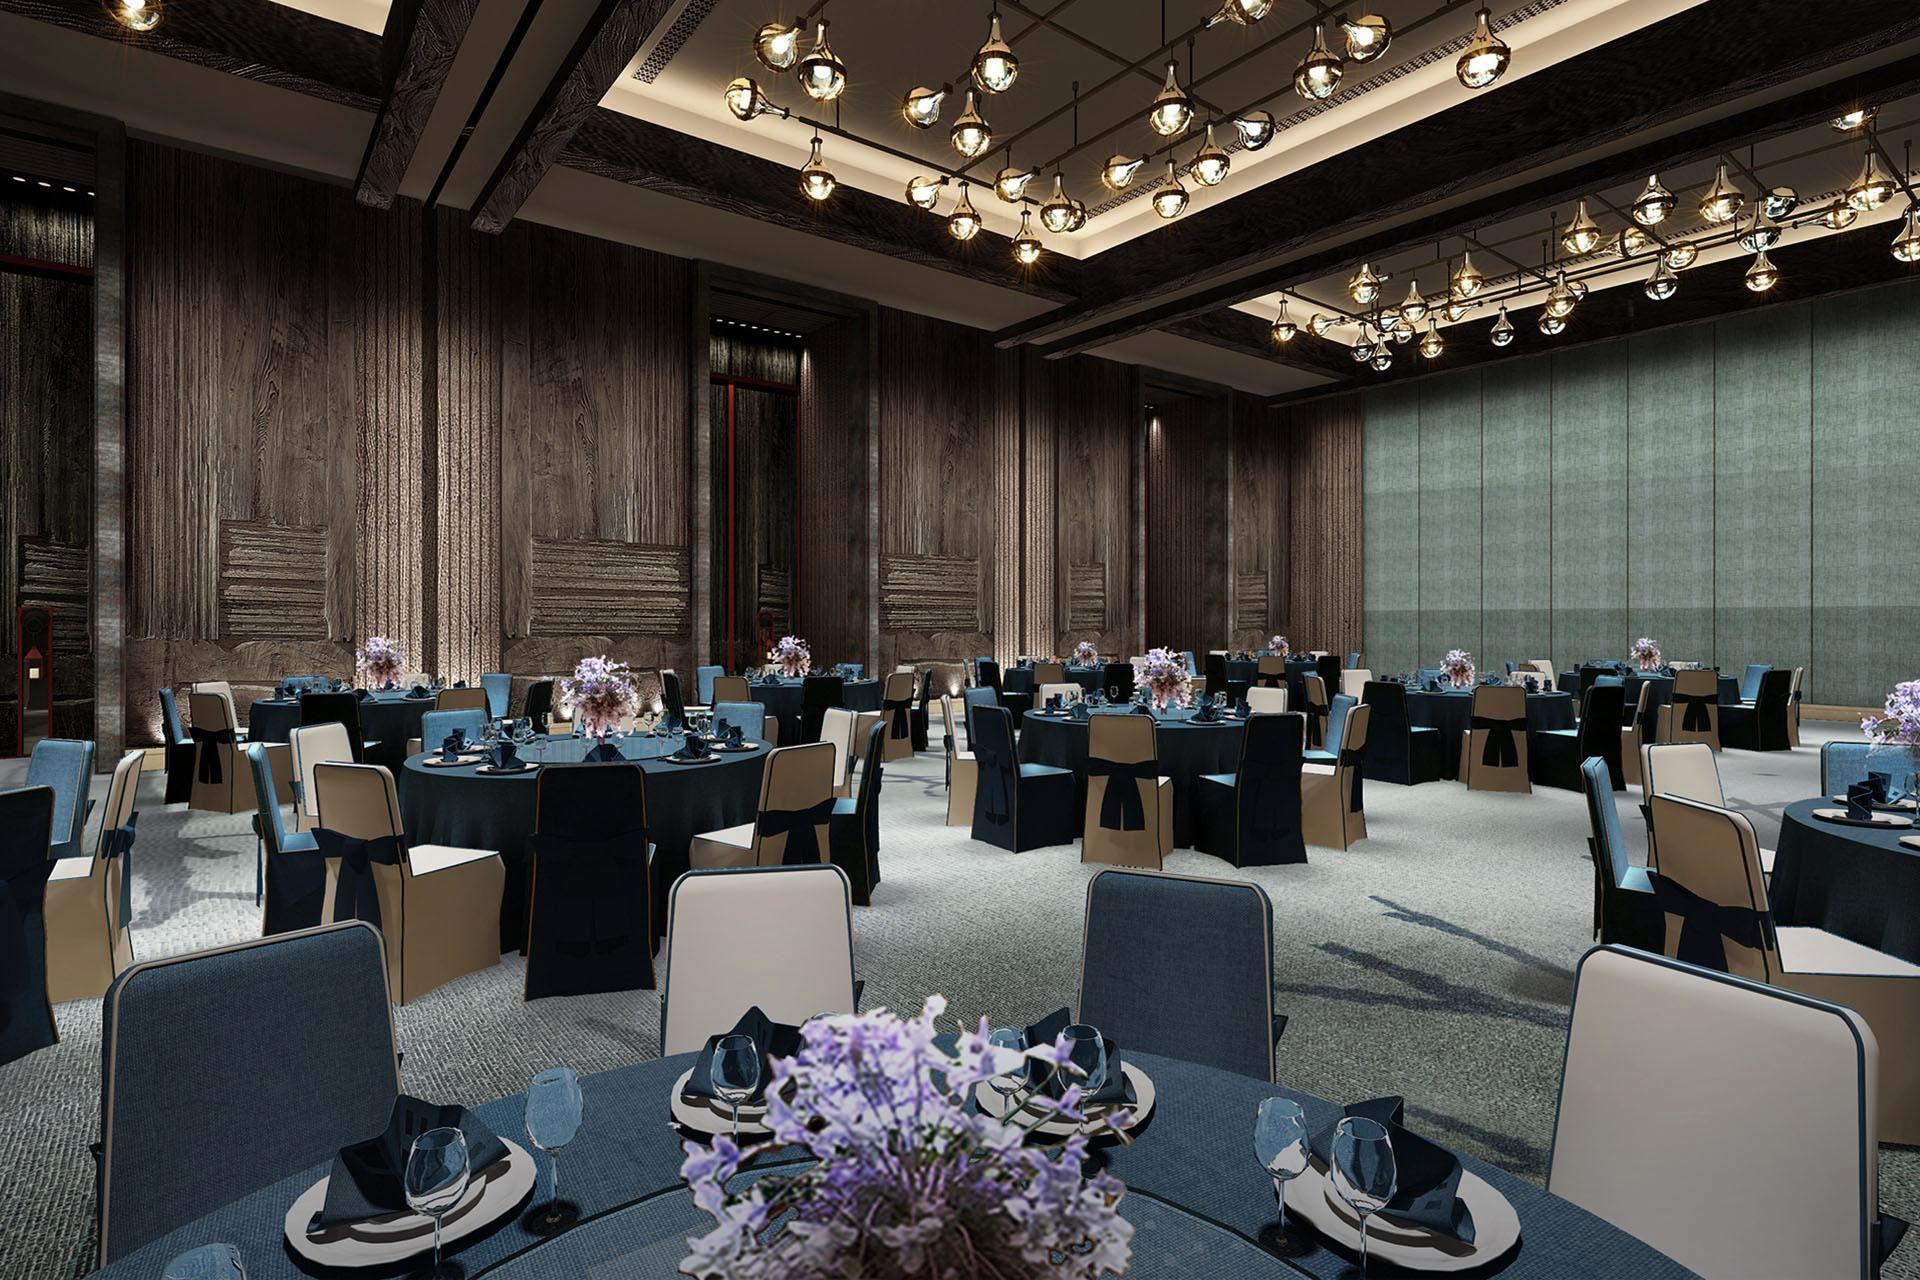 The Lighting Design Enlightens This Restaurant And Creates